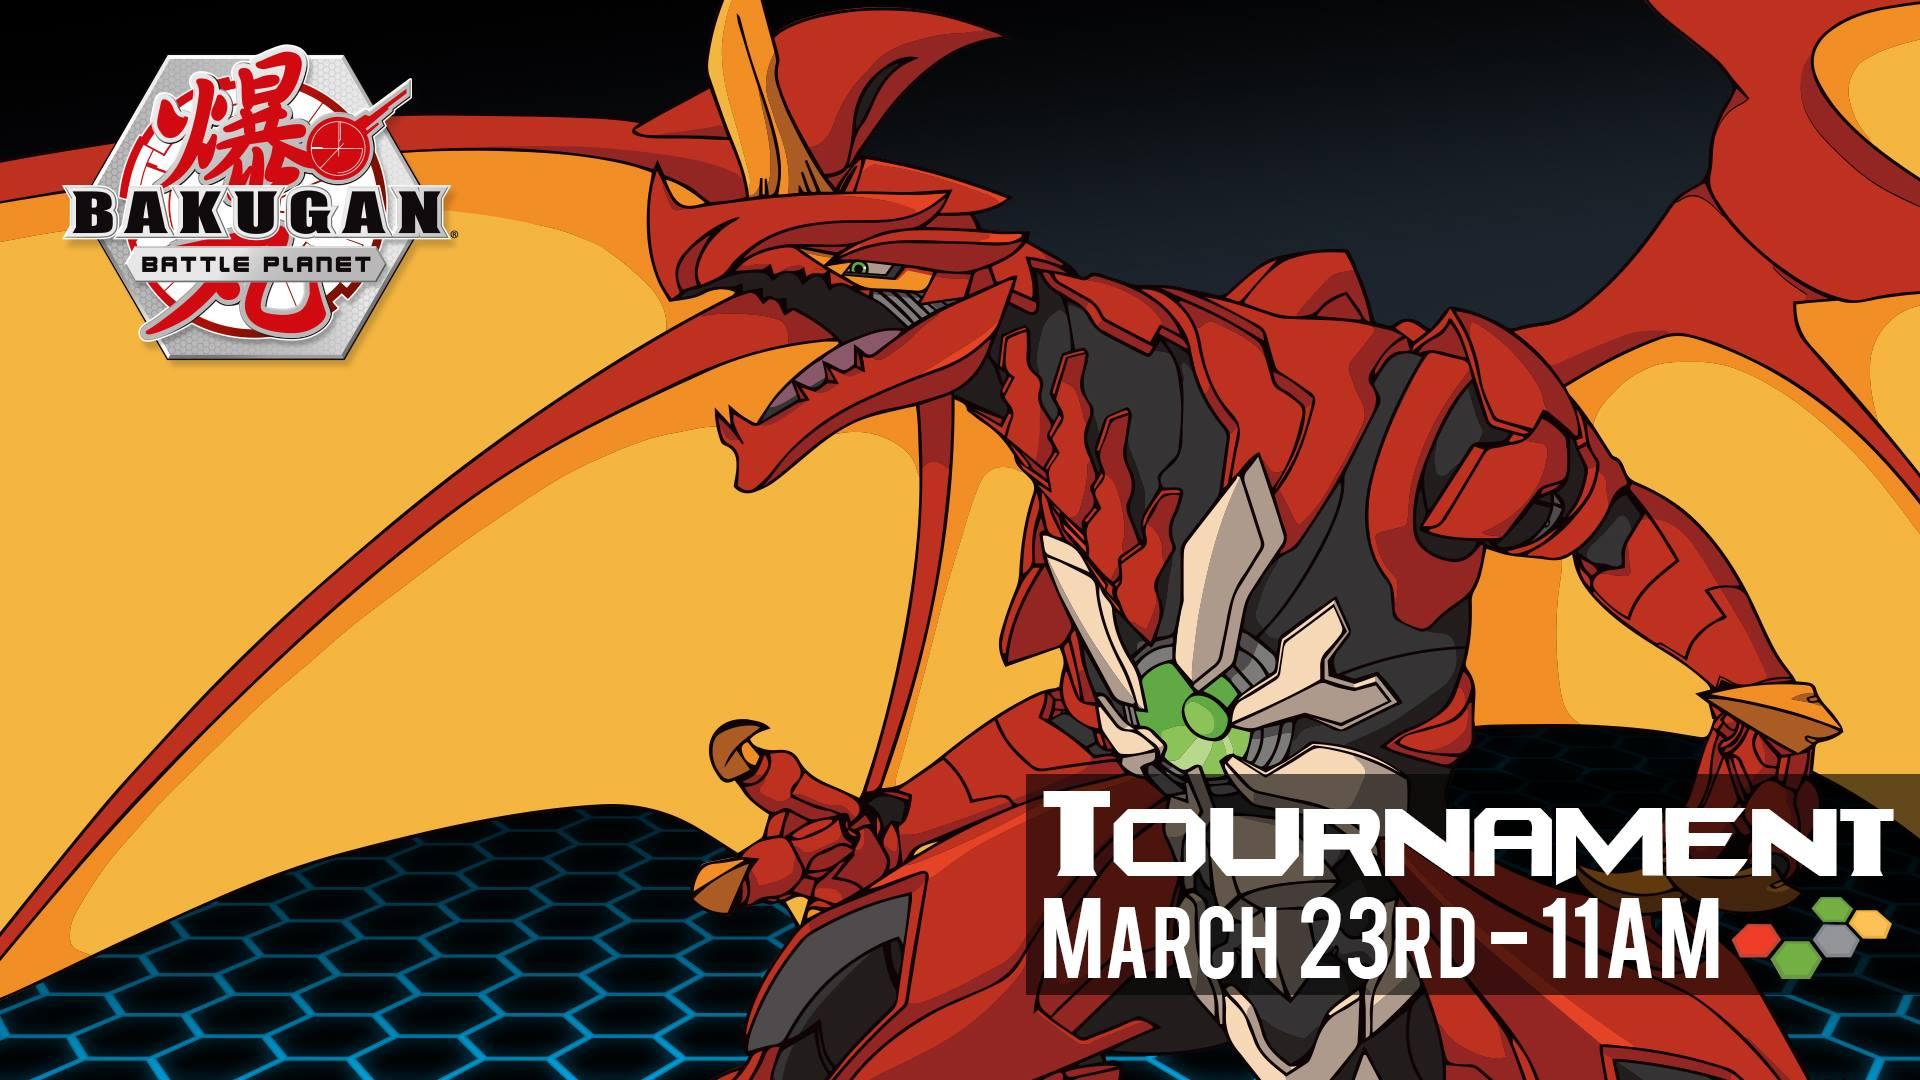 Bakugan Tournament Event Image.jpg